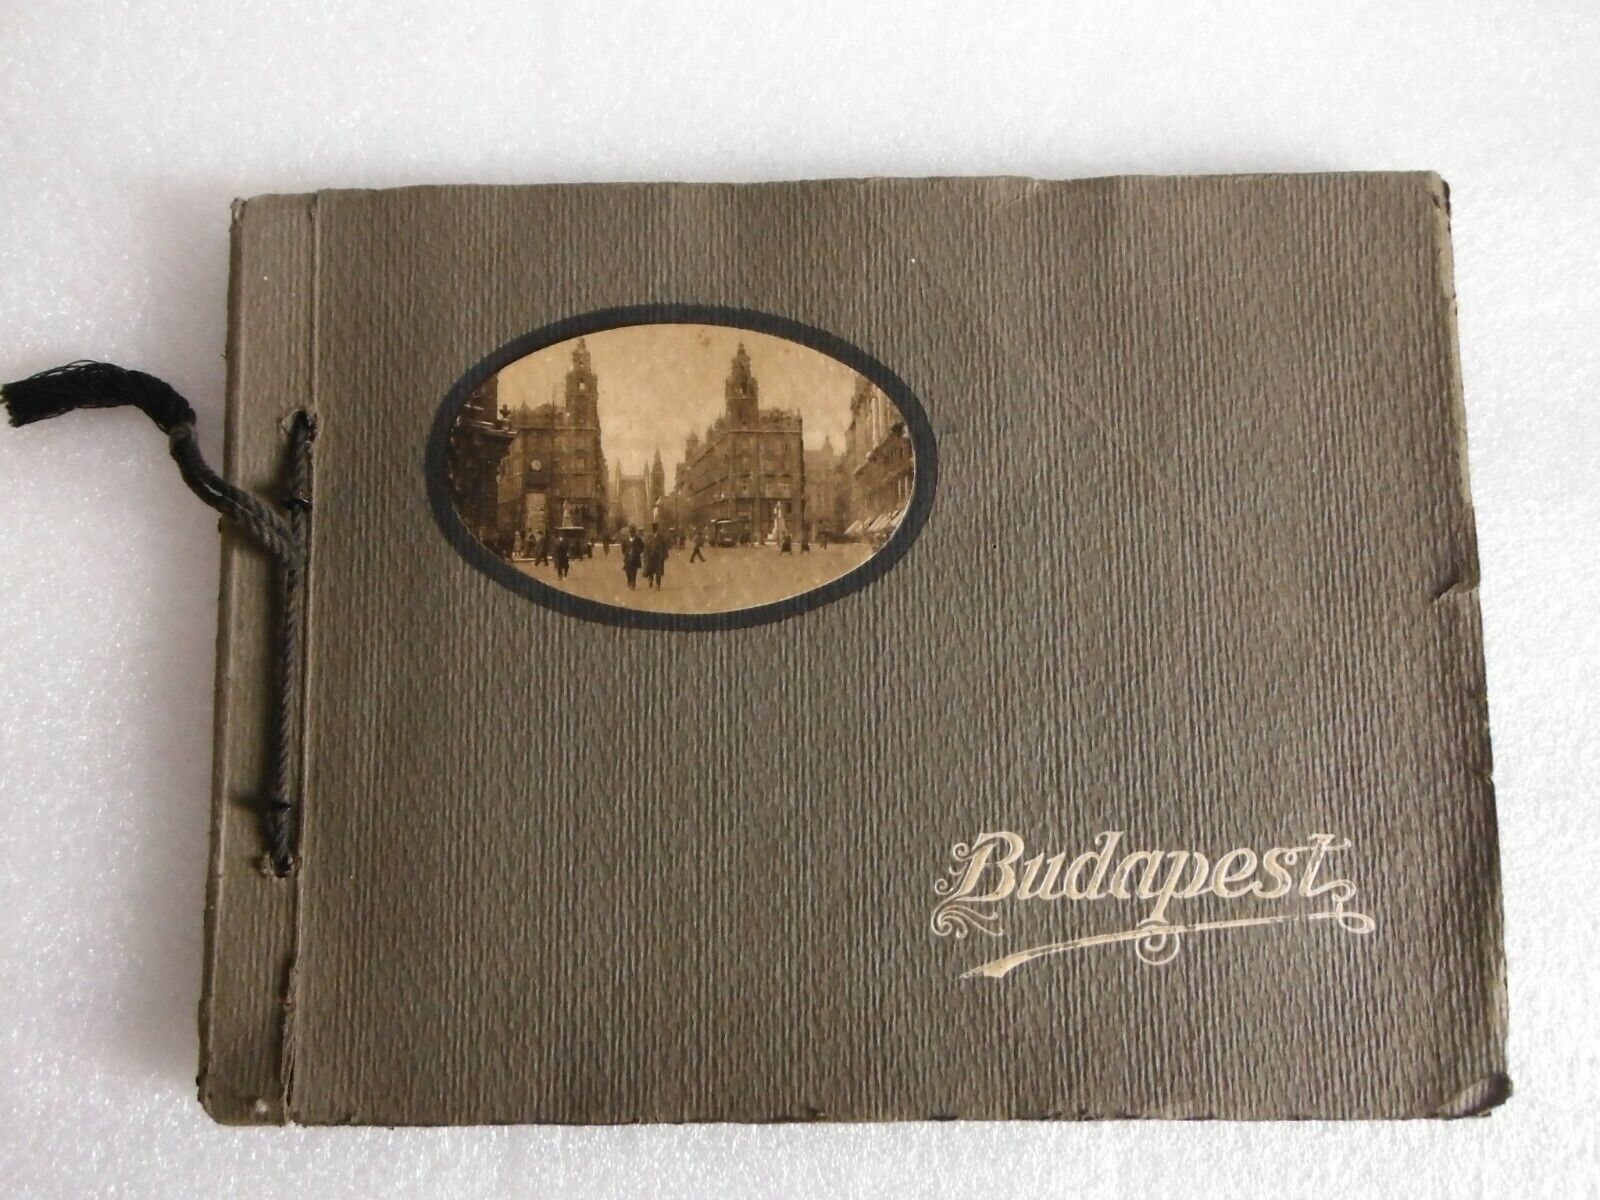 BUDAPEST in Ungarn um 1910 Fotomappe